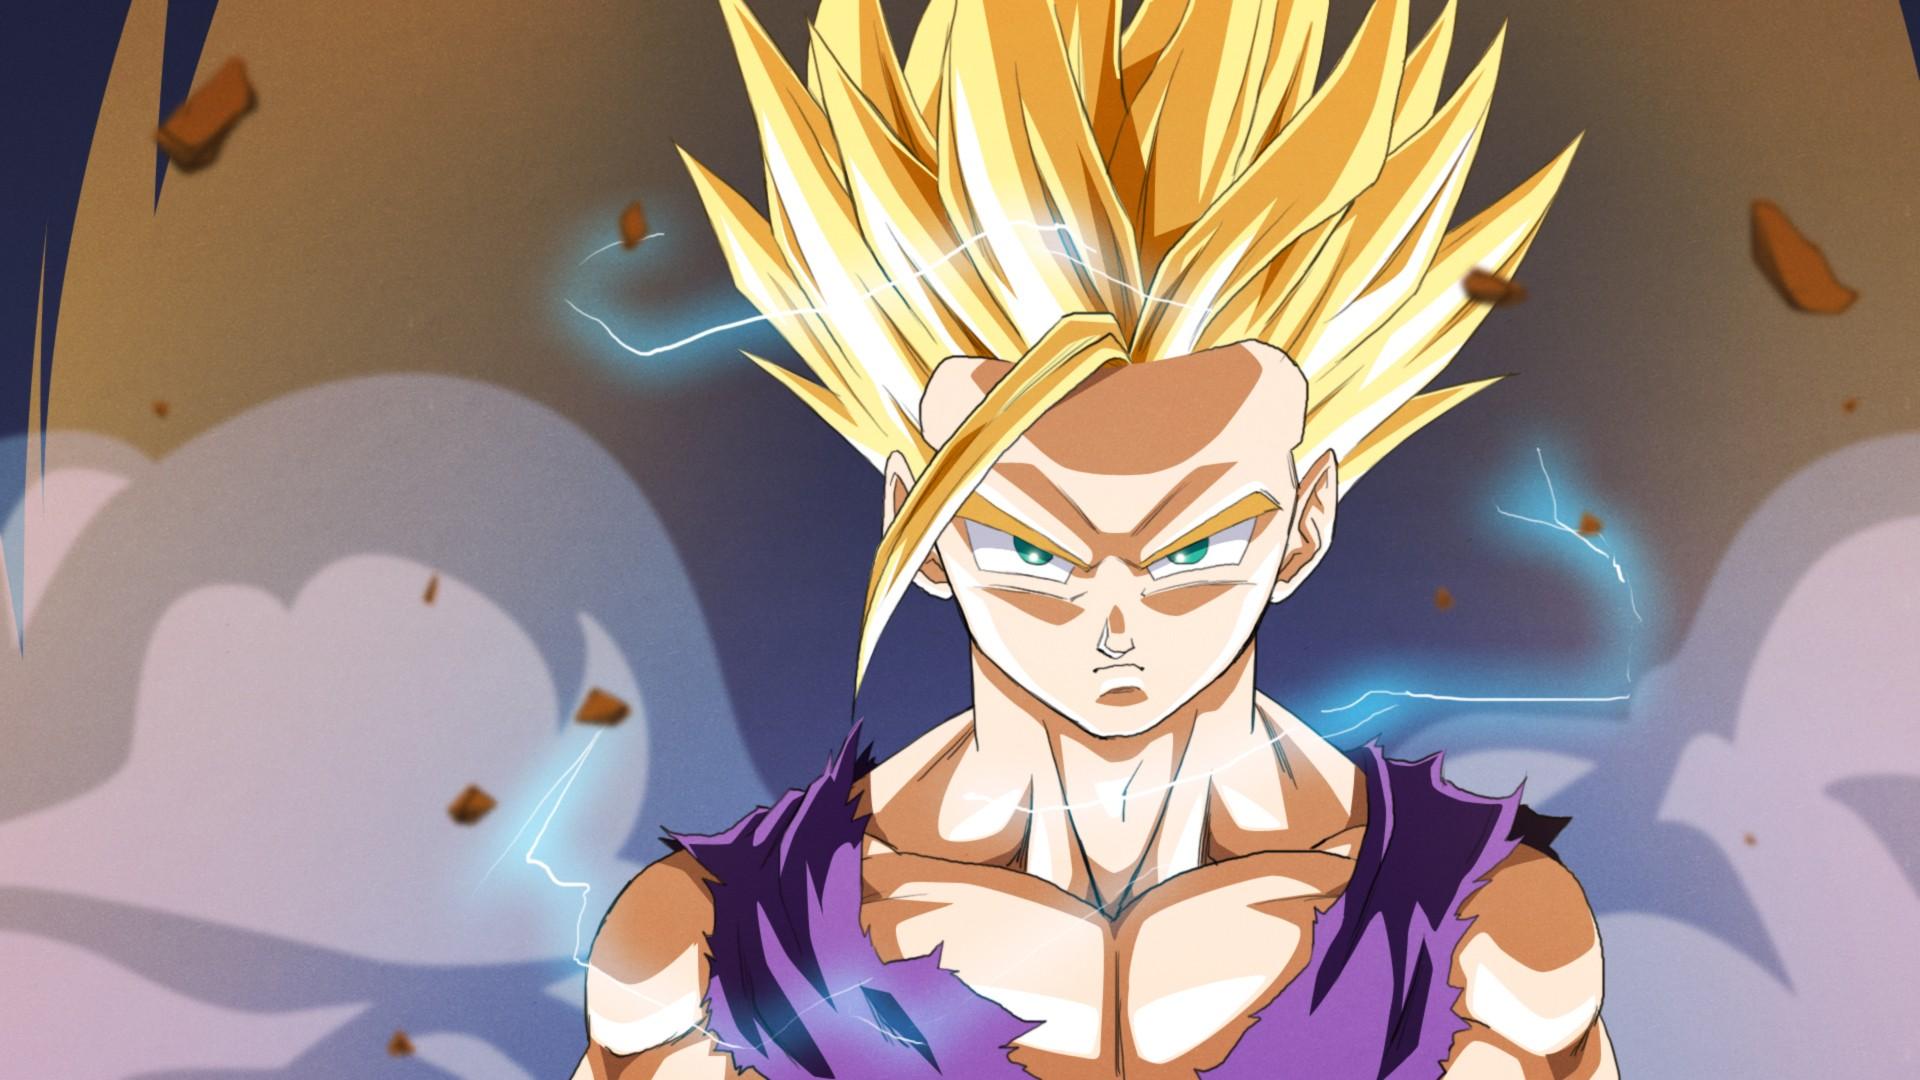 Anime 1920x1080 Dragon Ball Z Super Saiyan 2 Gohan Dragon Ball Super Saiyan anime